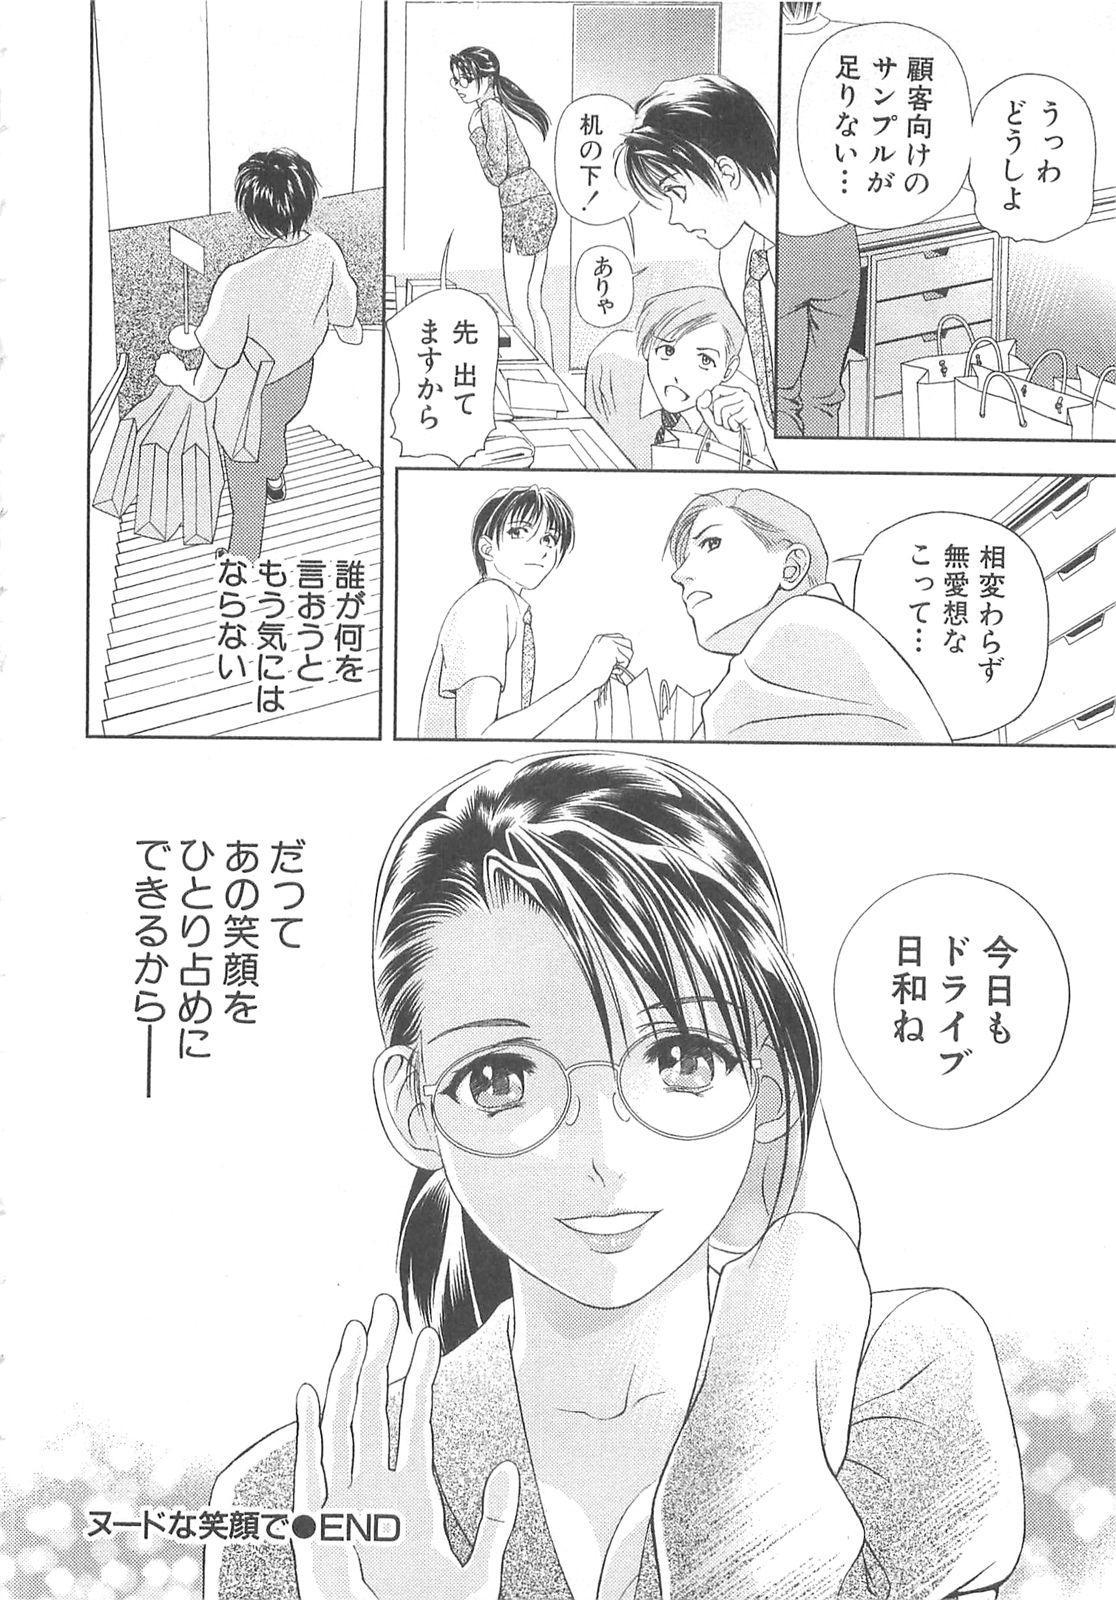 Tenshi no Kyuu - Angel's Pretty Hip 190